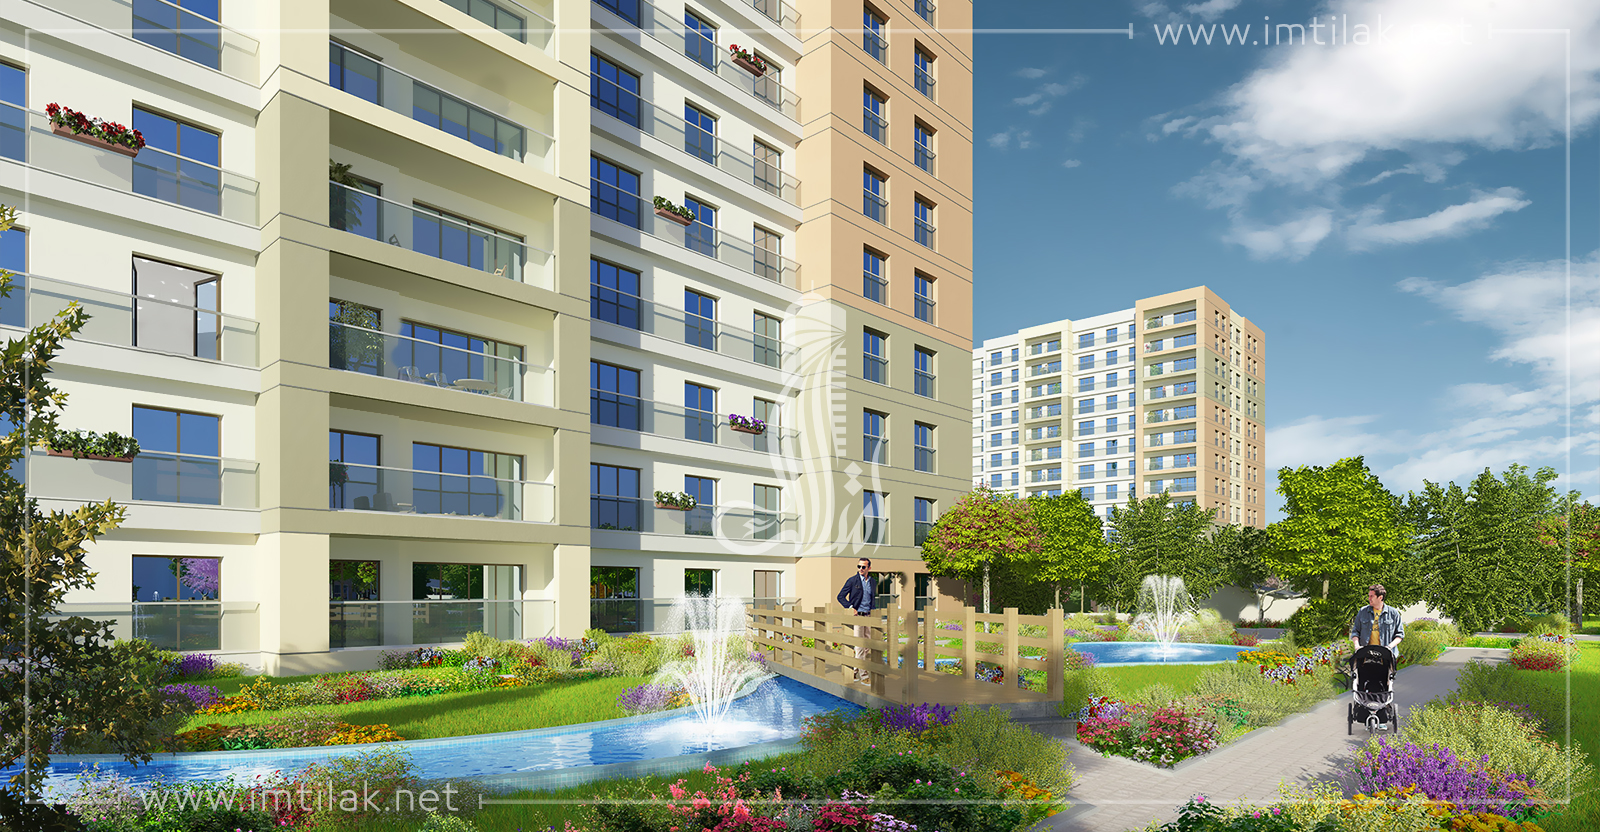 IMT- ۱۷۲ پروژه مسکونی مارمارا ۴